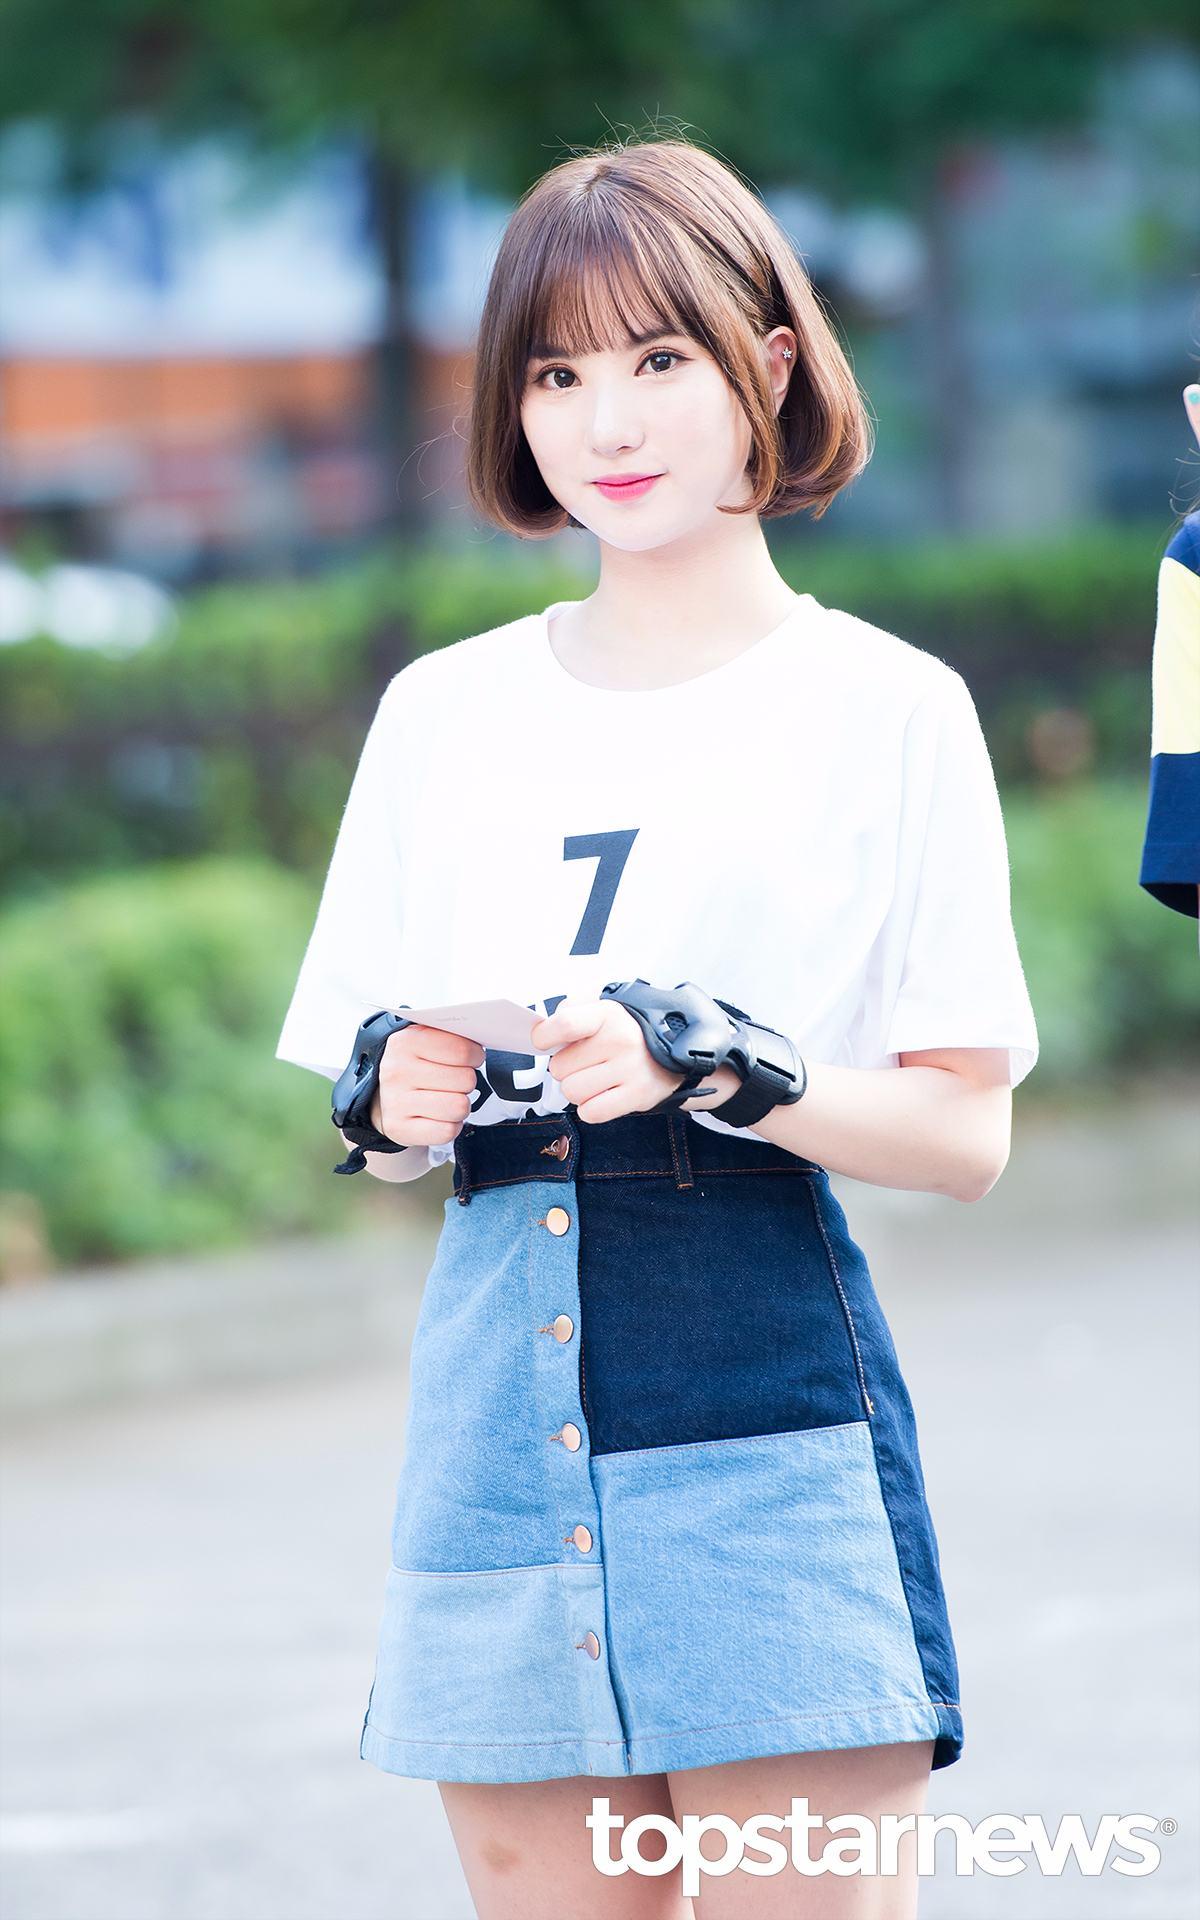 GFRIEND的Eunha穿了一條拼接的牛仔裙,配上簡單的數字T,但是具有設計的裙子配上A字型的設計,可以讓自己看起來更顯瘦!